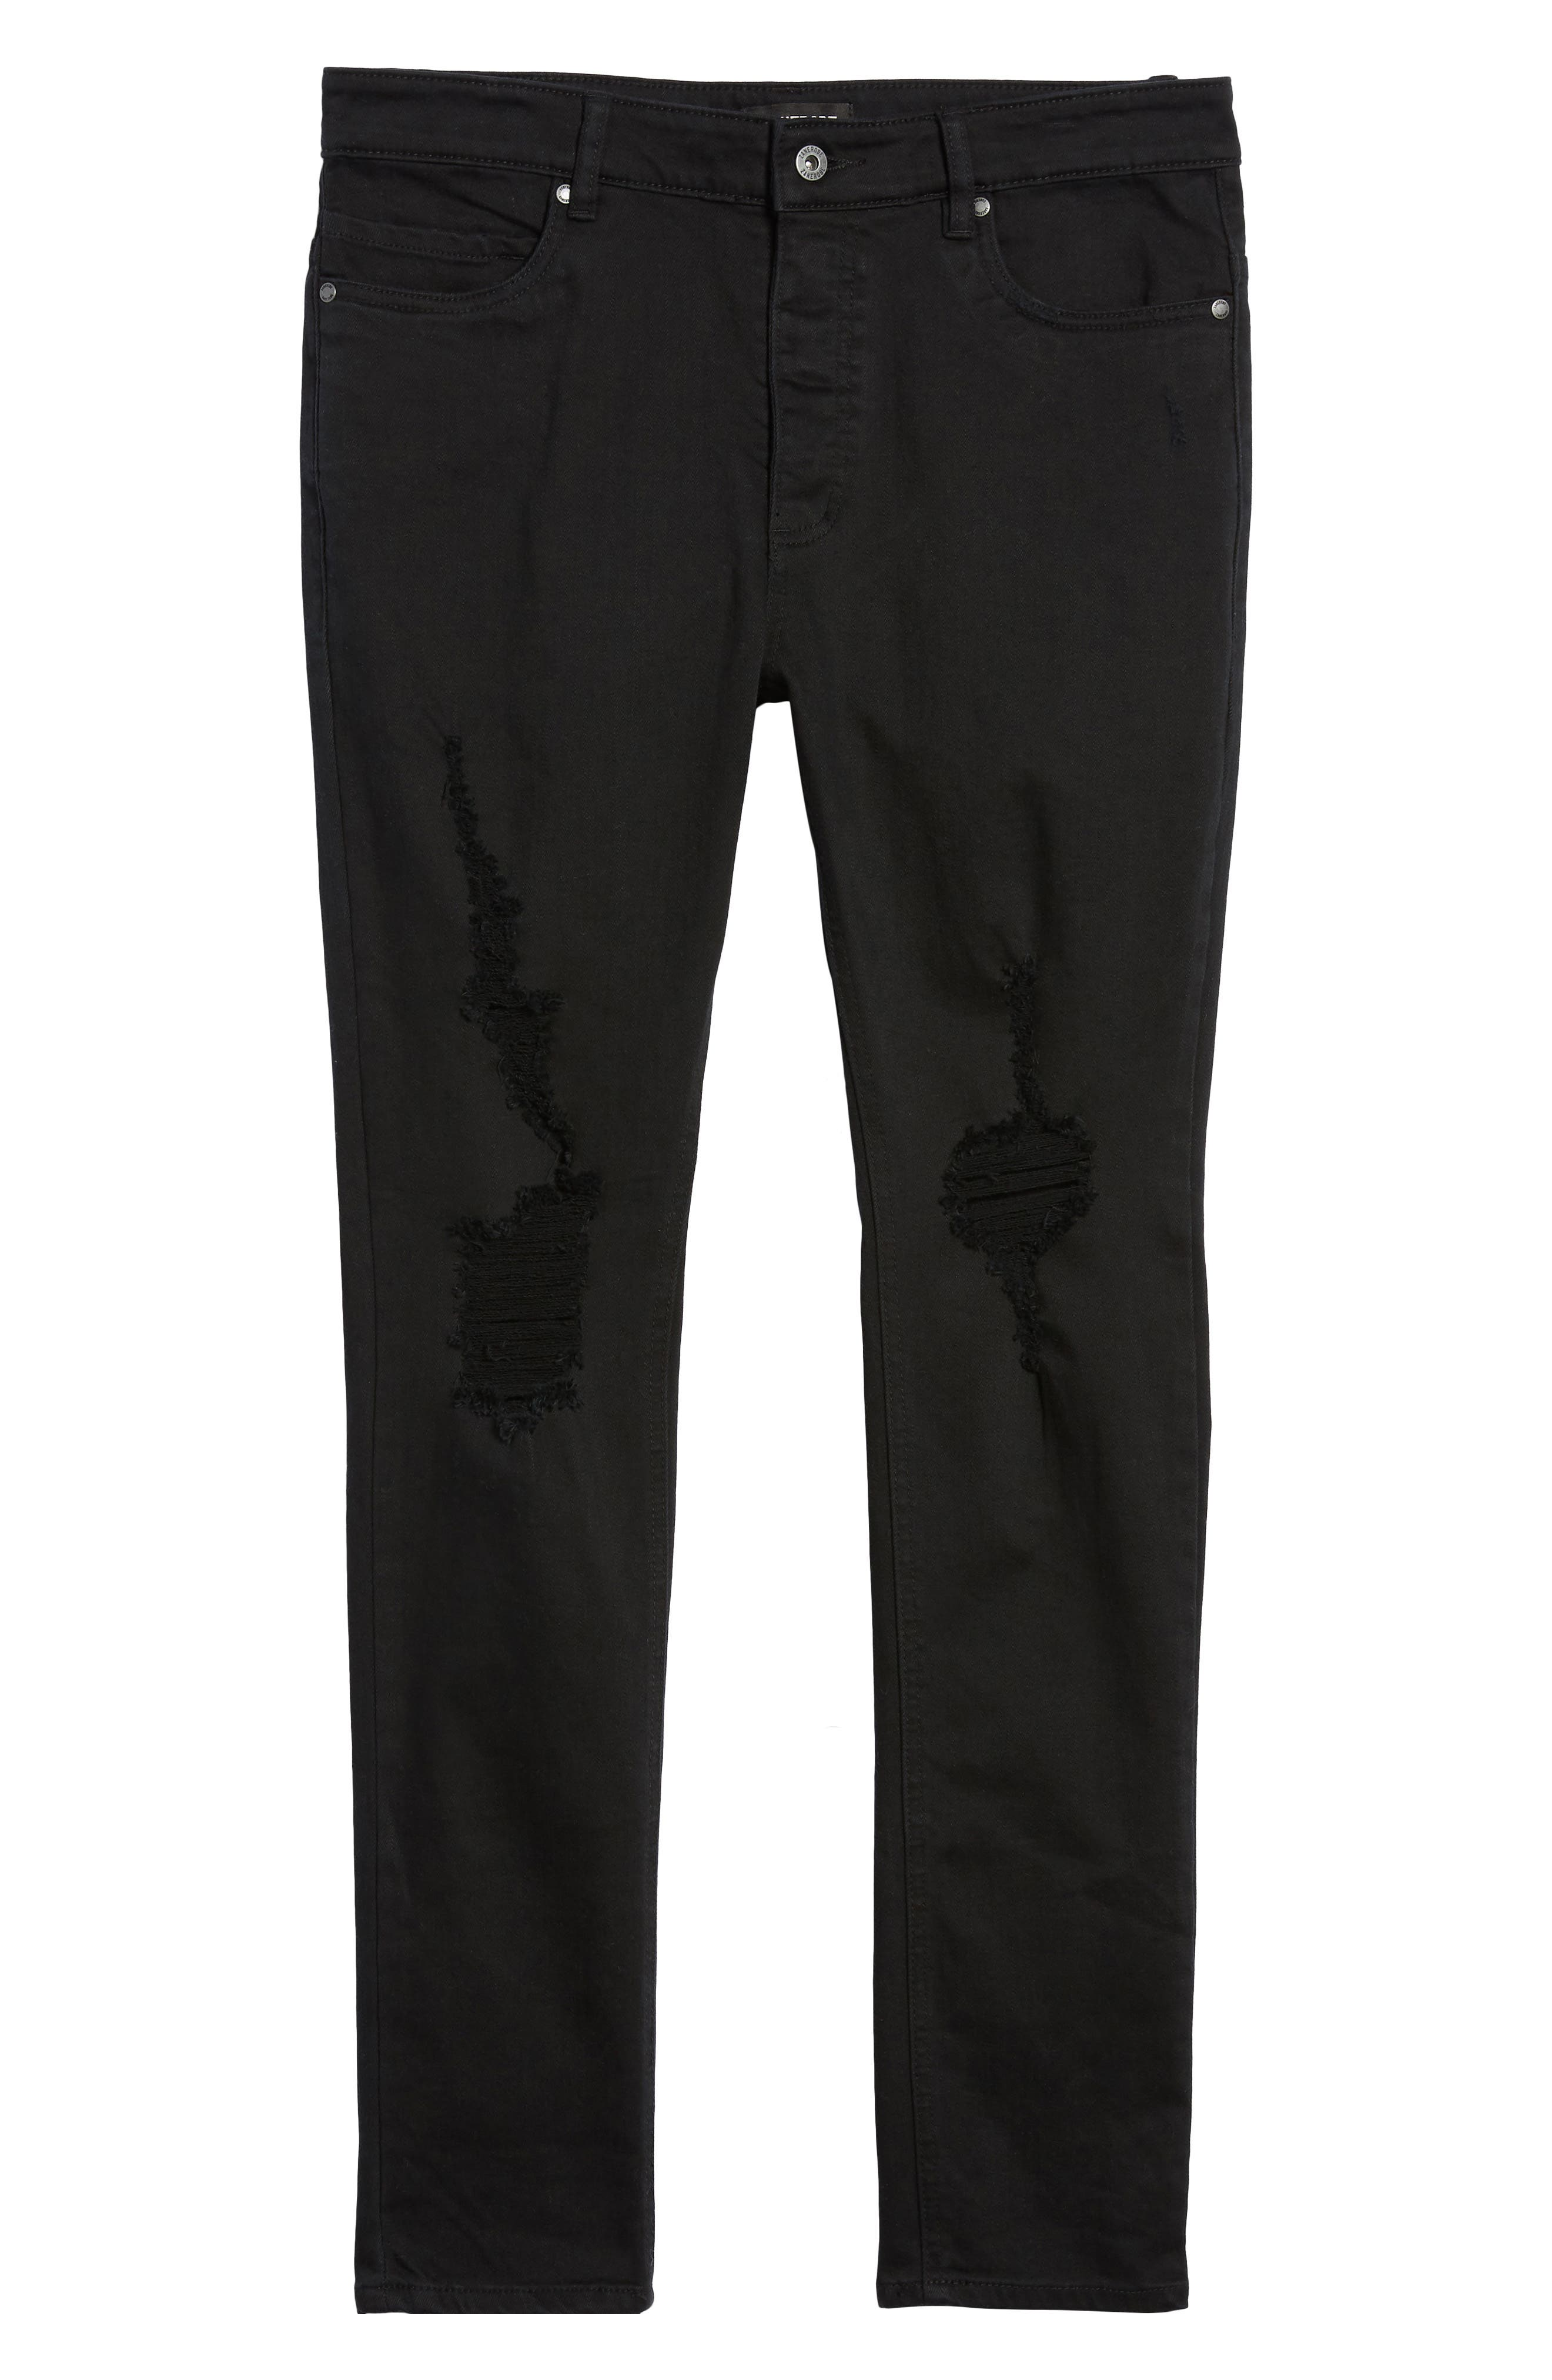 Joe Blow Destroyed Denim Jeans,                             Alternate thumbnail 6, color,                             Black Shred